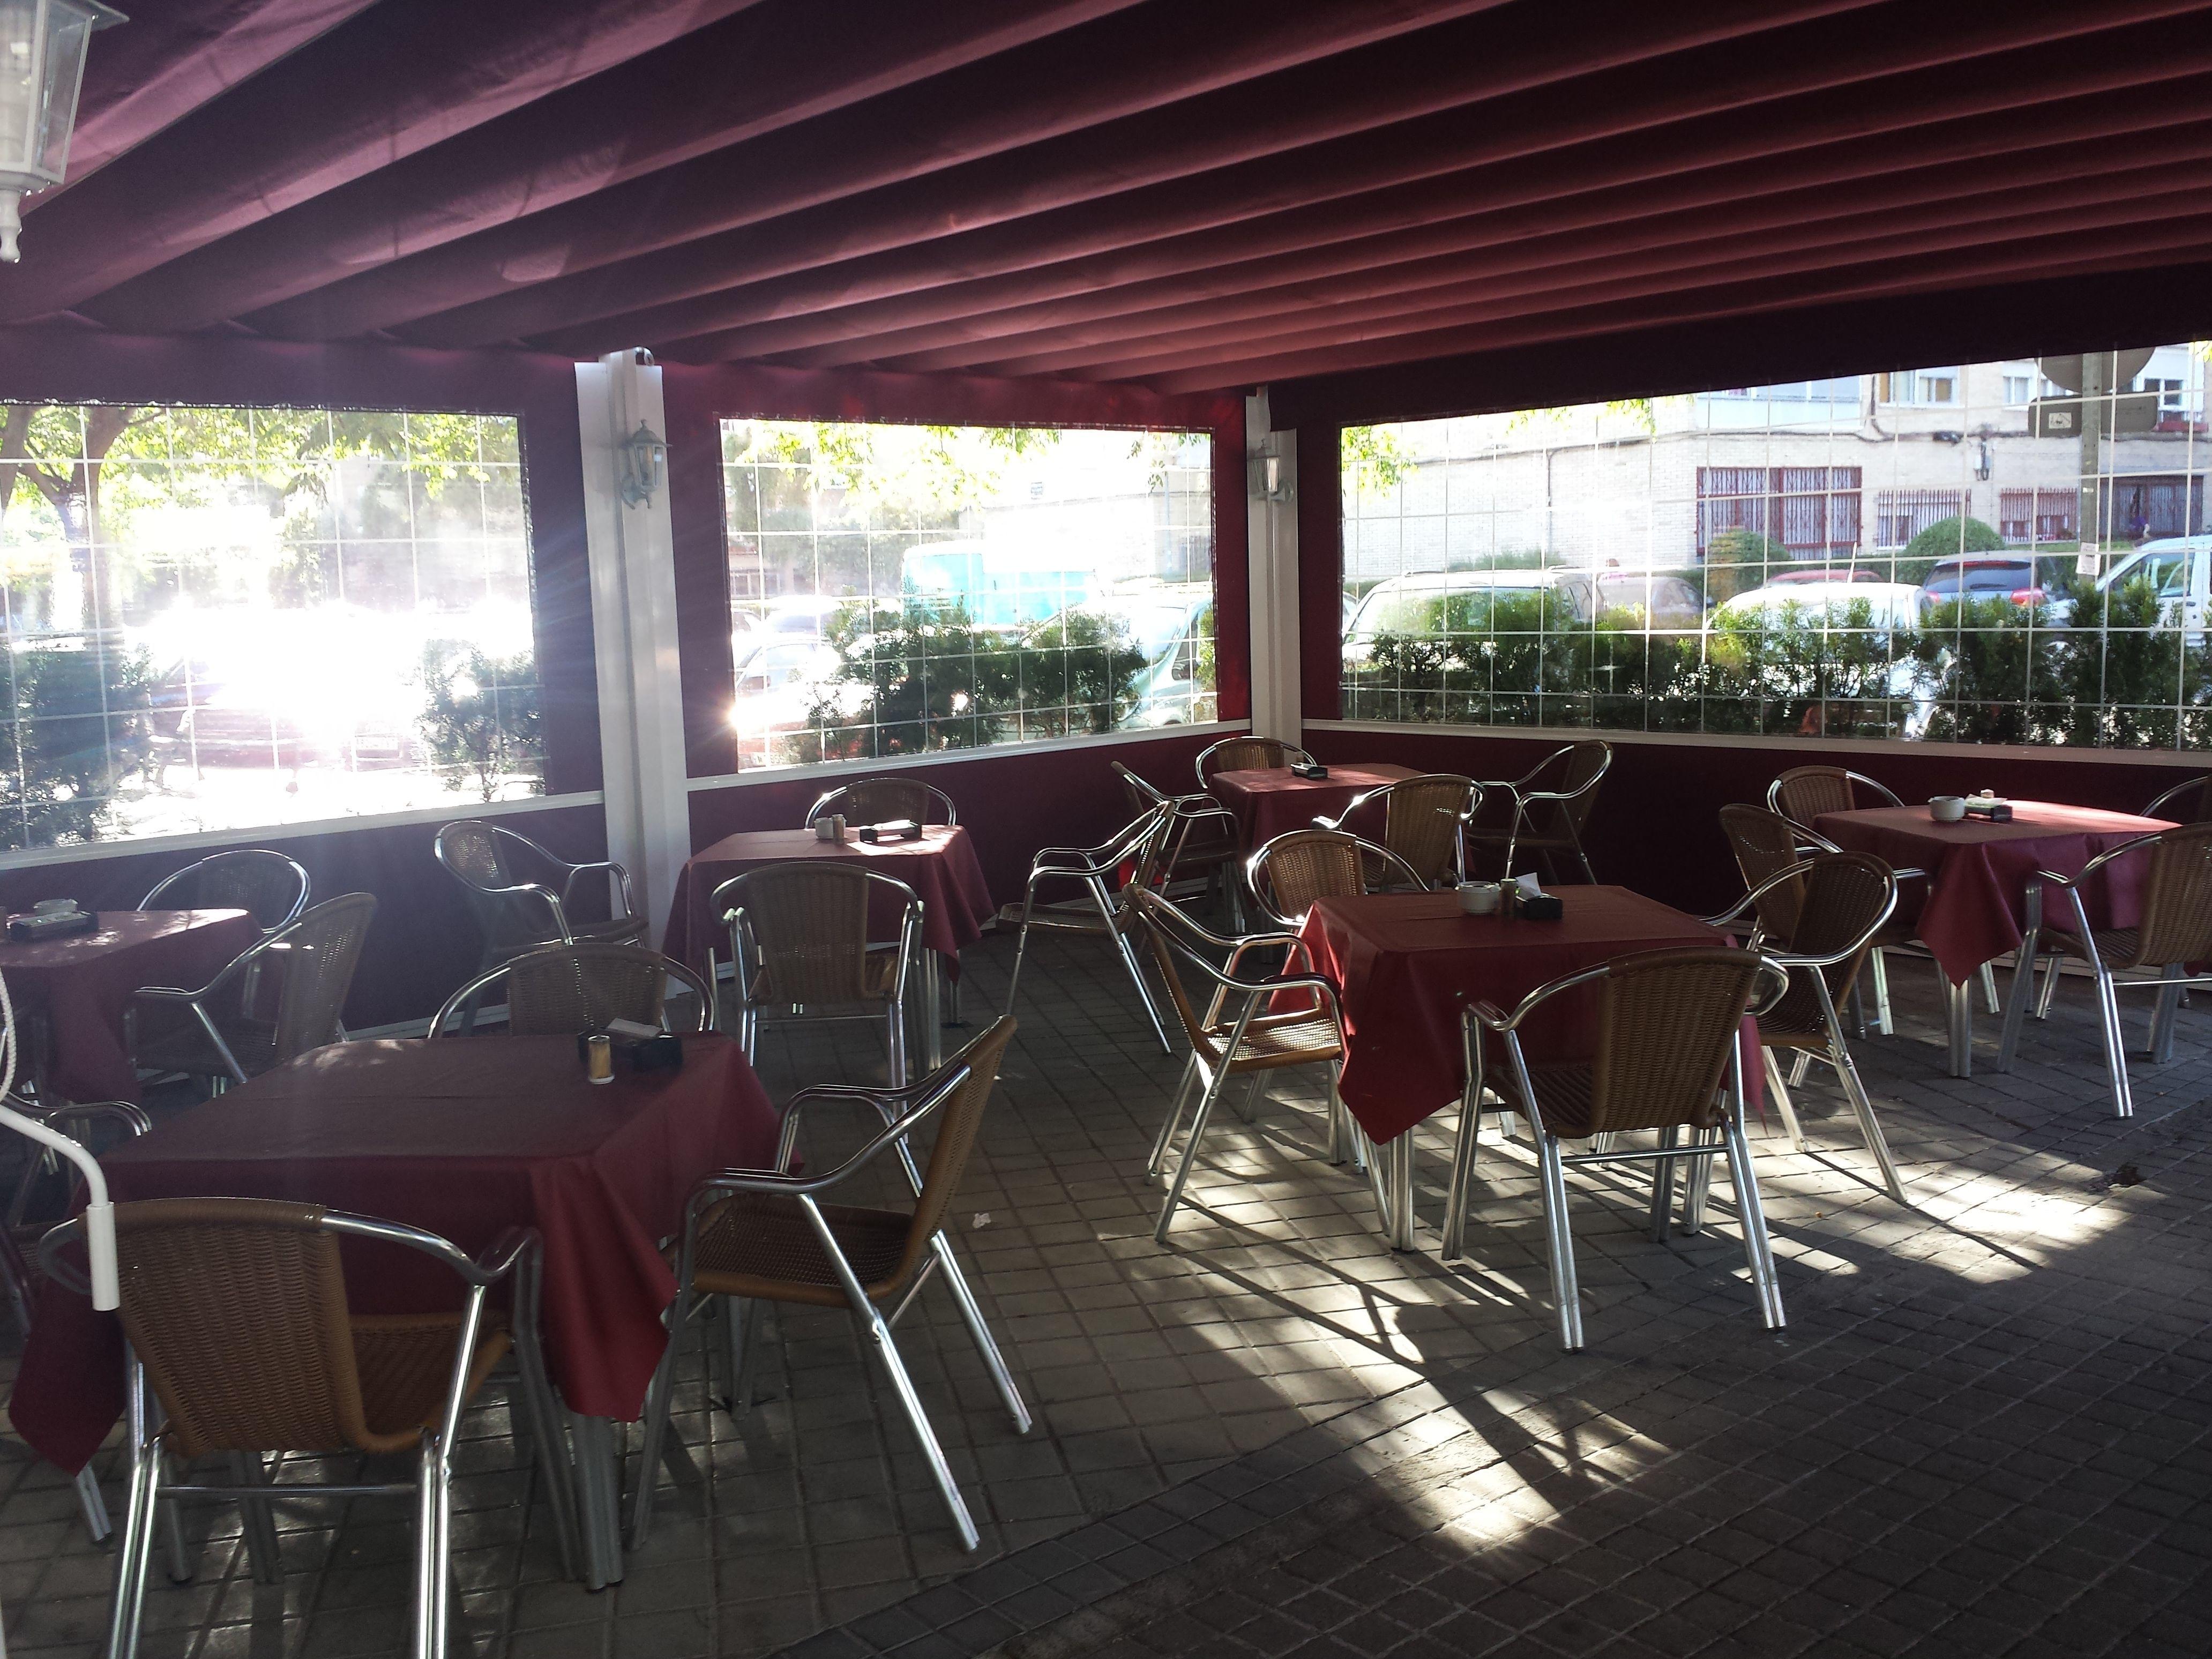 Foto 3 de Cocina marinera en Torrejón de Ardoz | Restaurante Marisquería Plaza